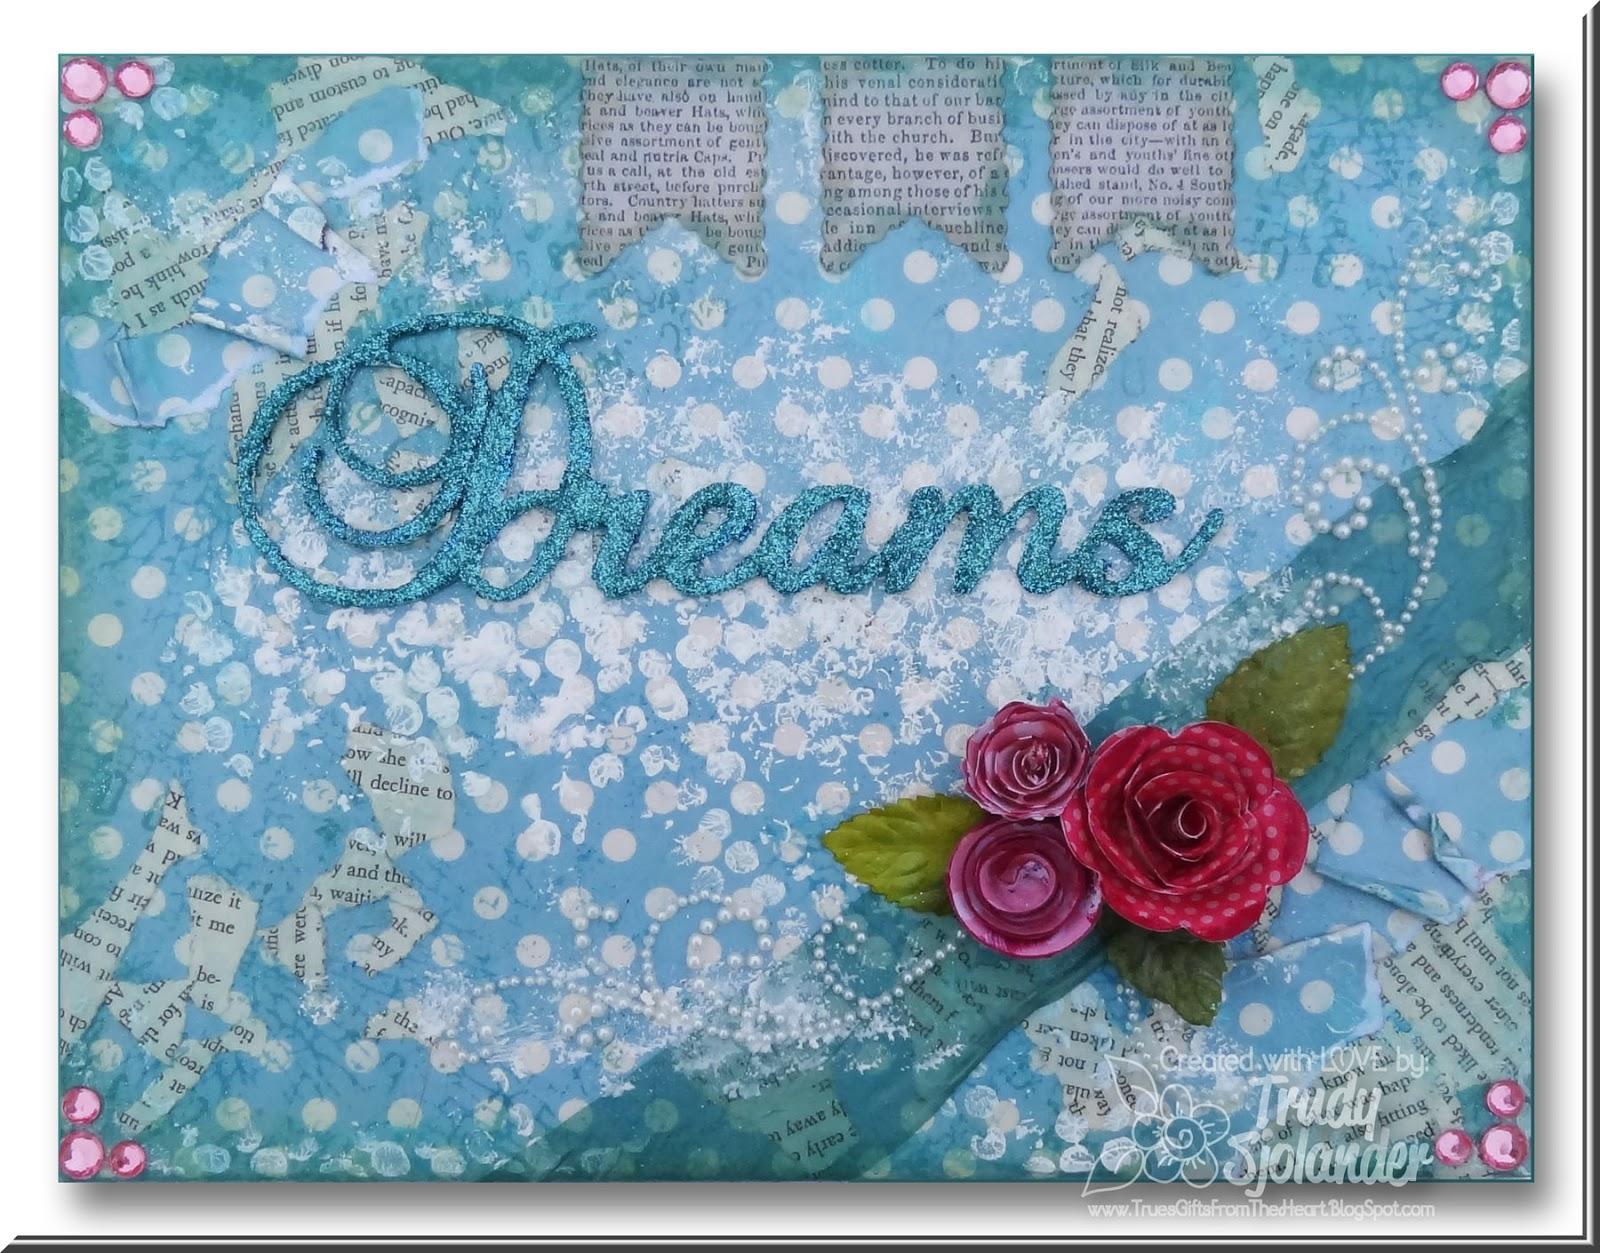 http://1.bp.blogspot.com/-Aw8xRYsUh10/UN2xy4m_RpI/AAAAAAAAH-w/8EgYe_tiXyA/s1600/Dream+canvas+watermarked.jpg